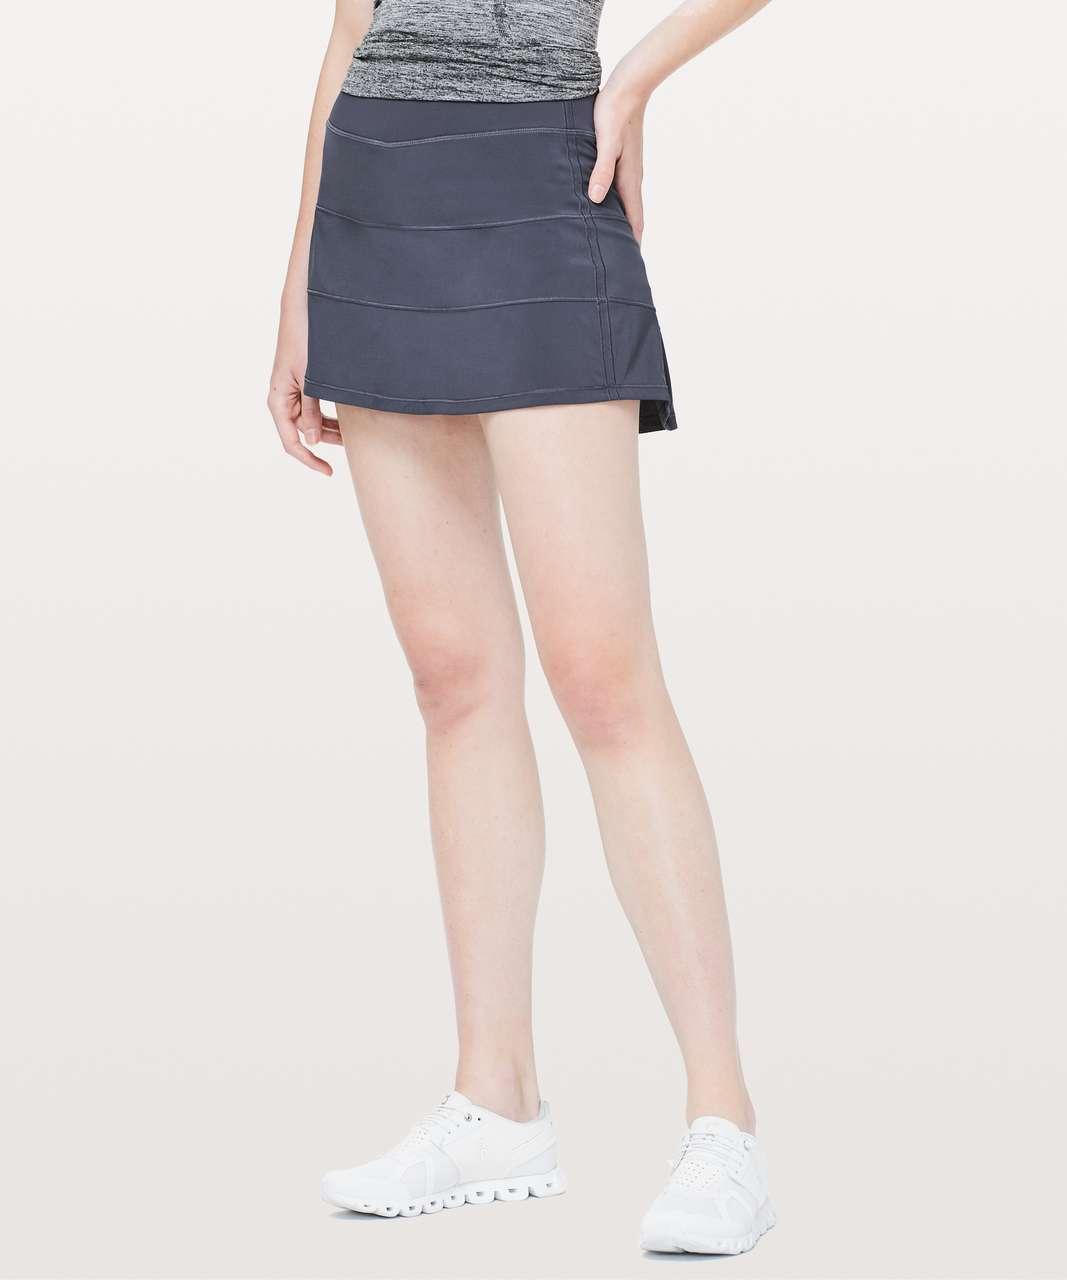 "Lululemon Pace Rival Skirt (Tall) *4-way Stretch 15"" - Cadet Blue"